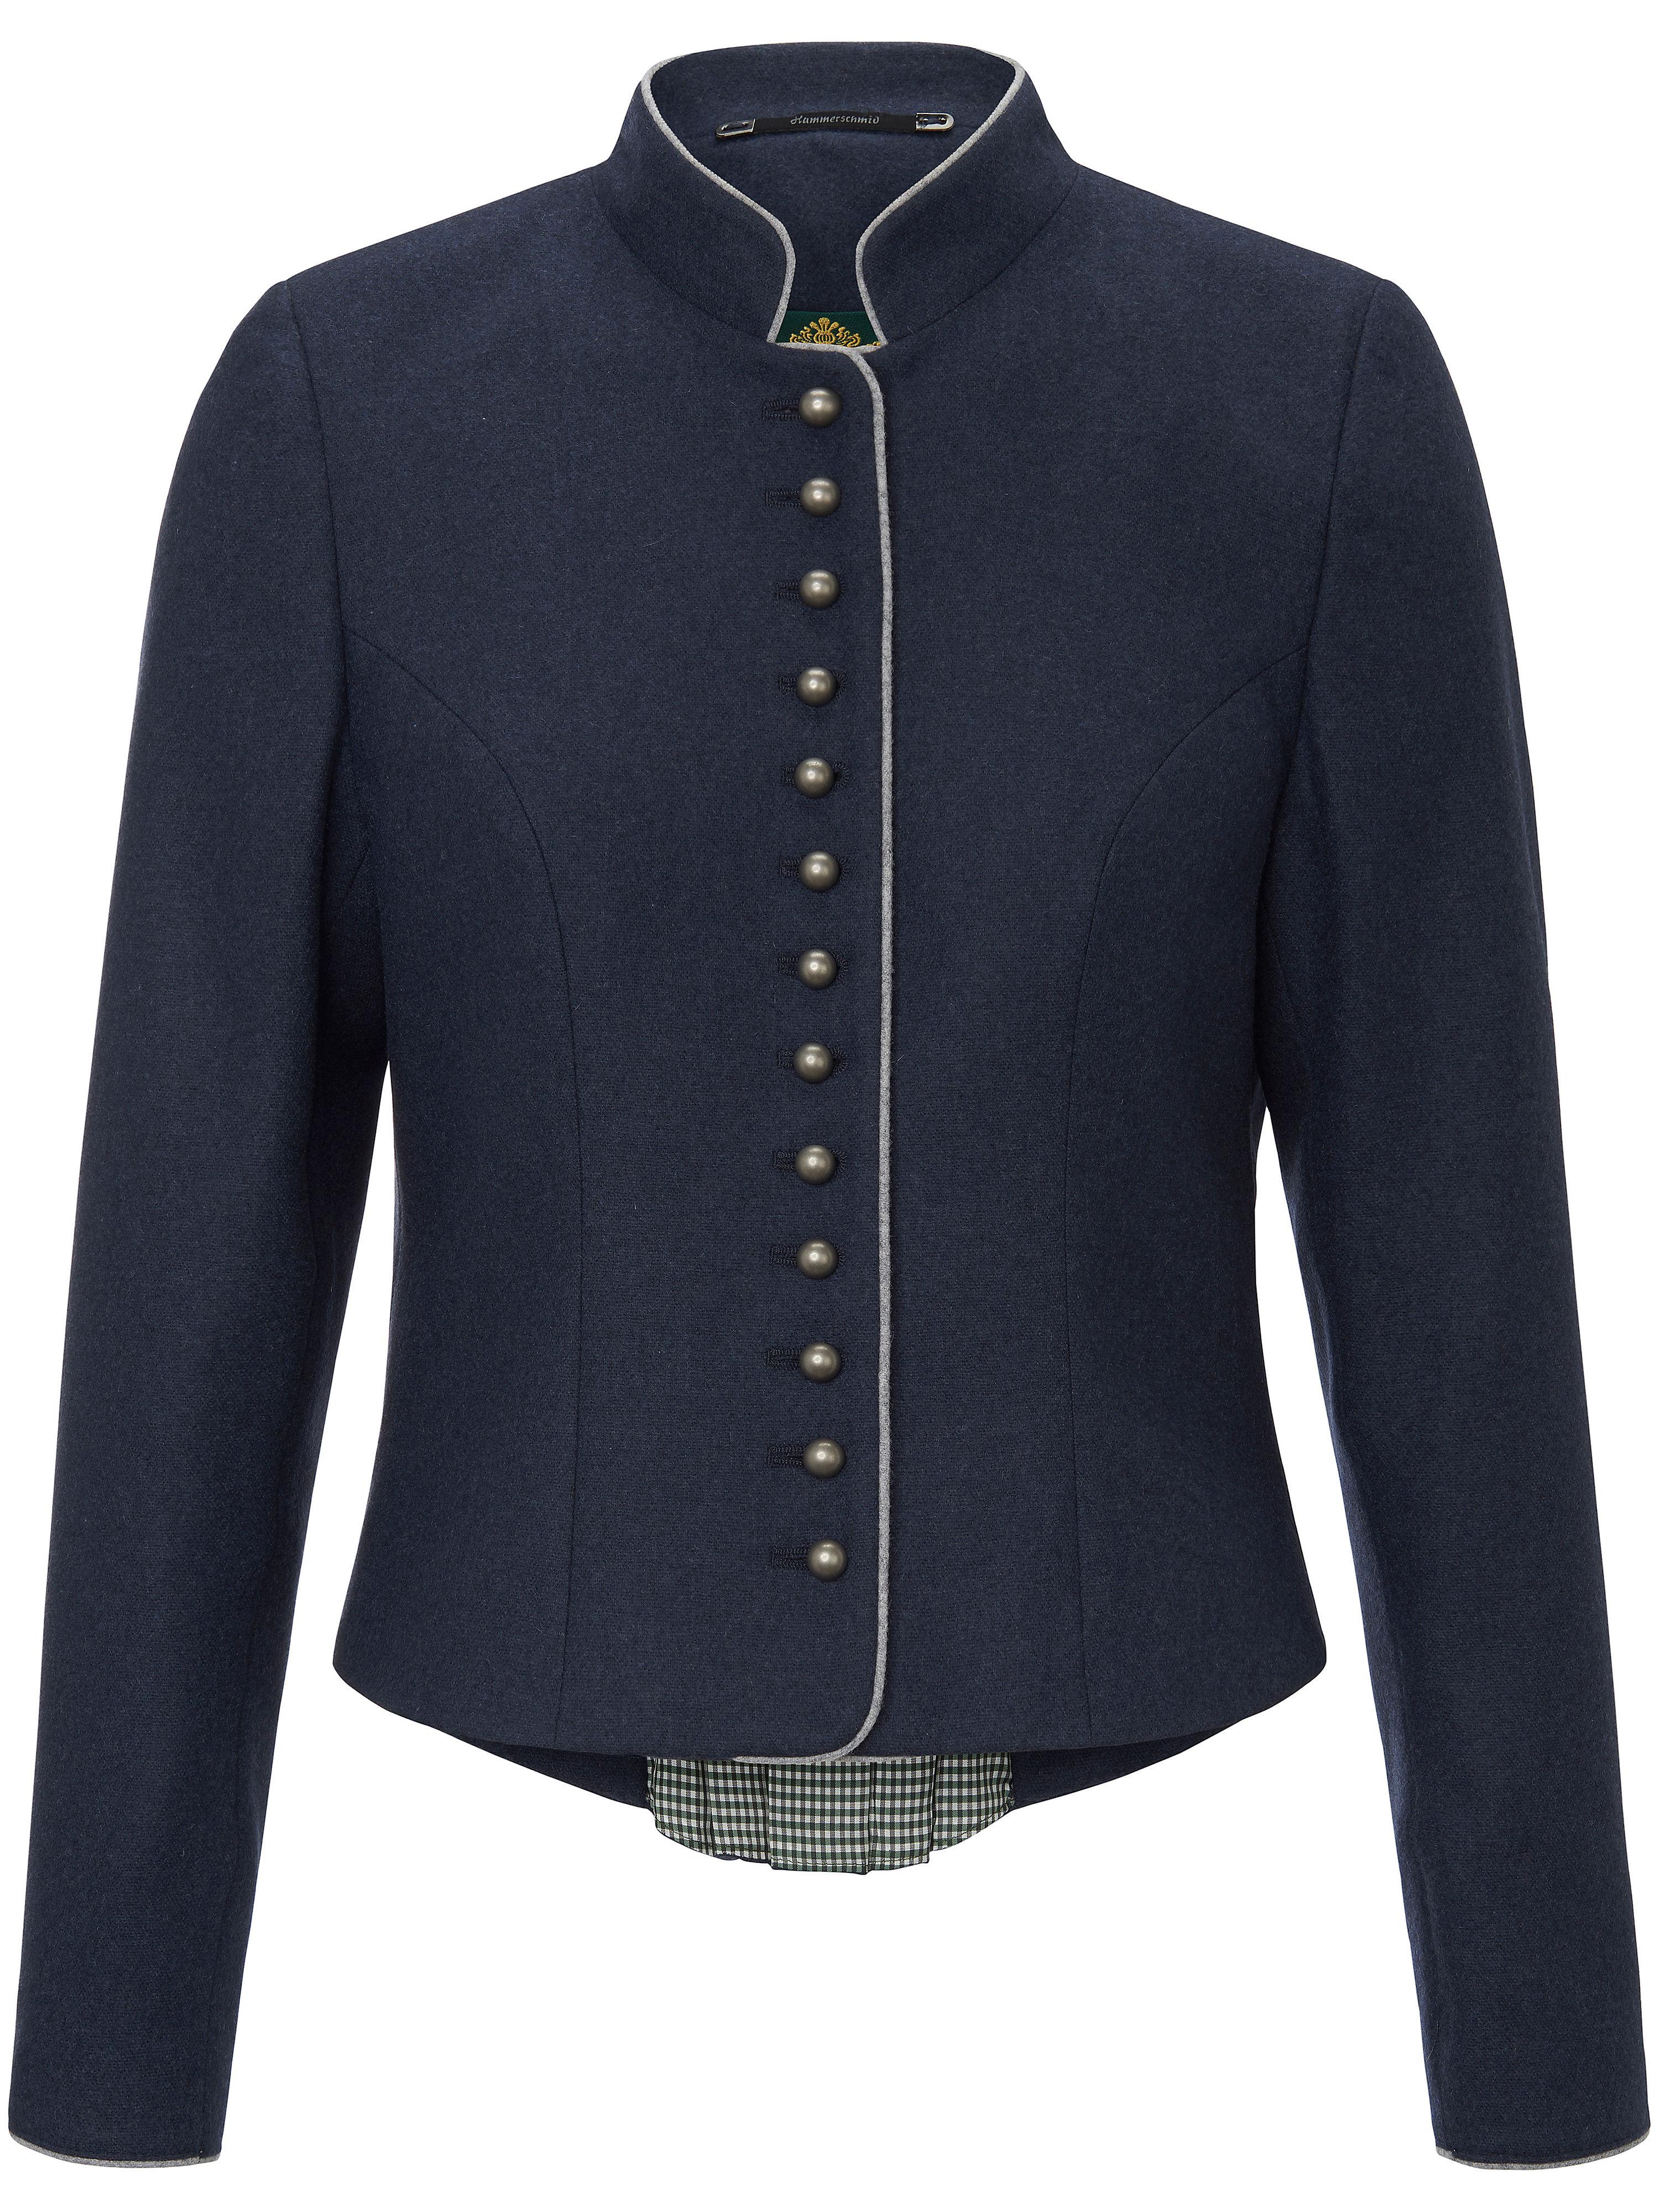 La veste bavaroise  Hammerschmid bleu